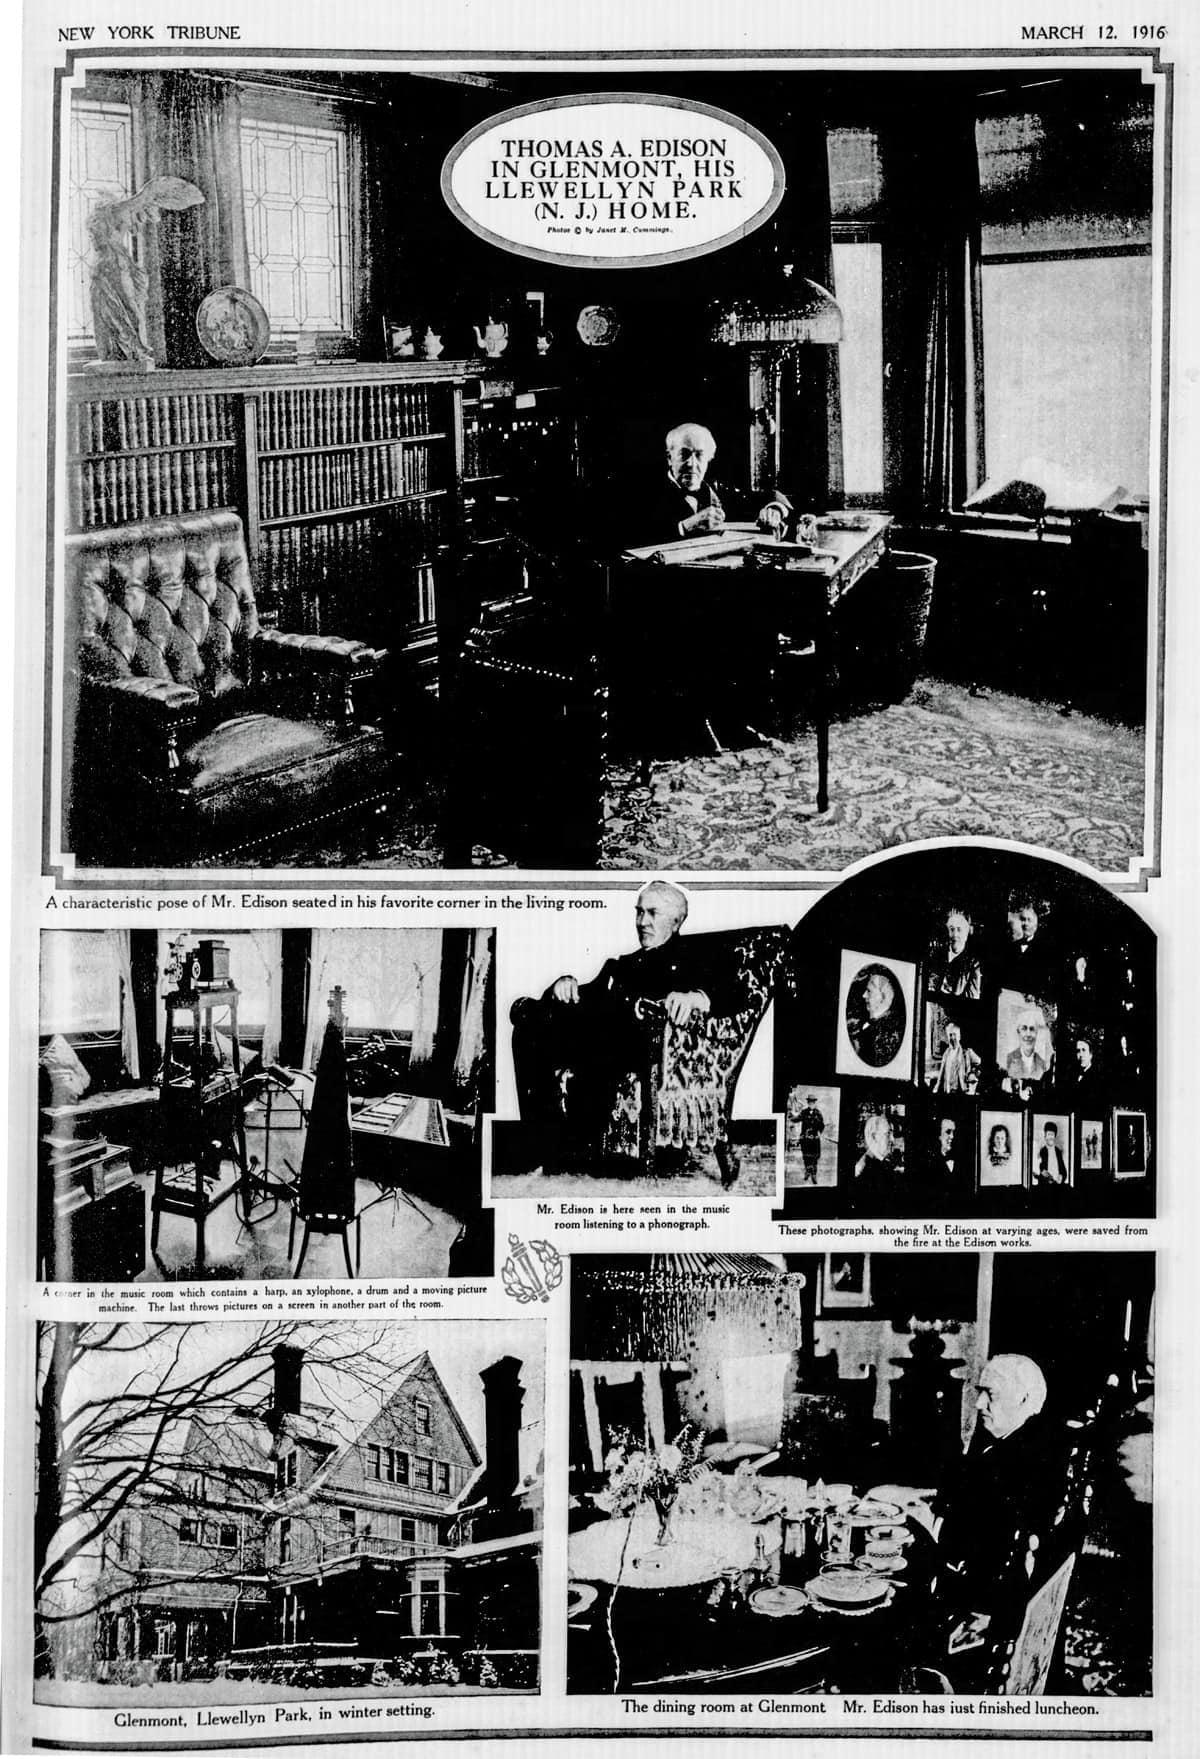 Thomas edison at home 1916 click americana for Edison home show